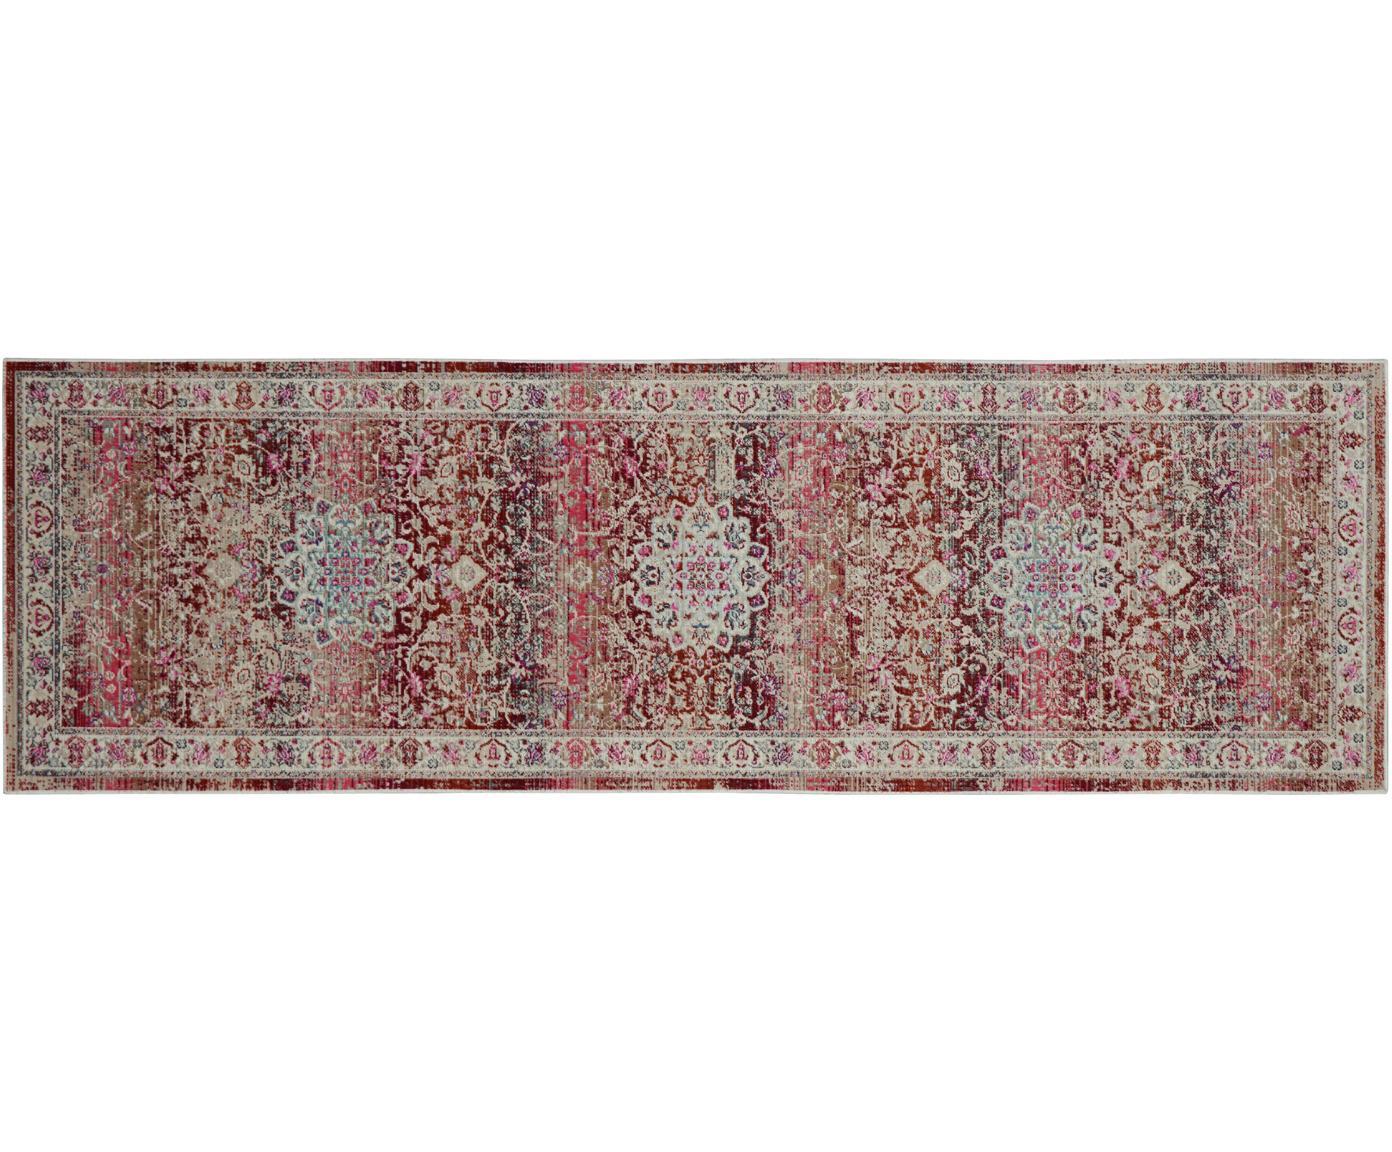 Passatoia a pelo corto Kashan Age, Retro: Latex, Beige, tonalità rosse, Larg. 60 x Lung. 180 cm